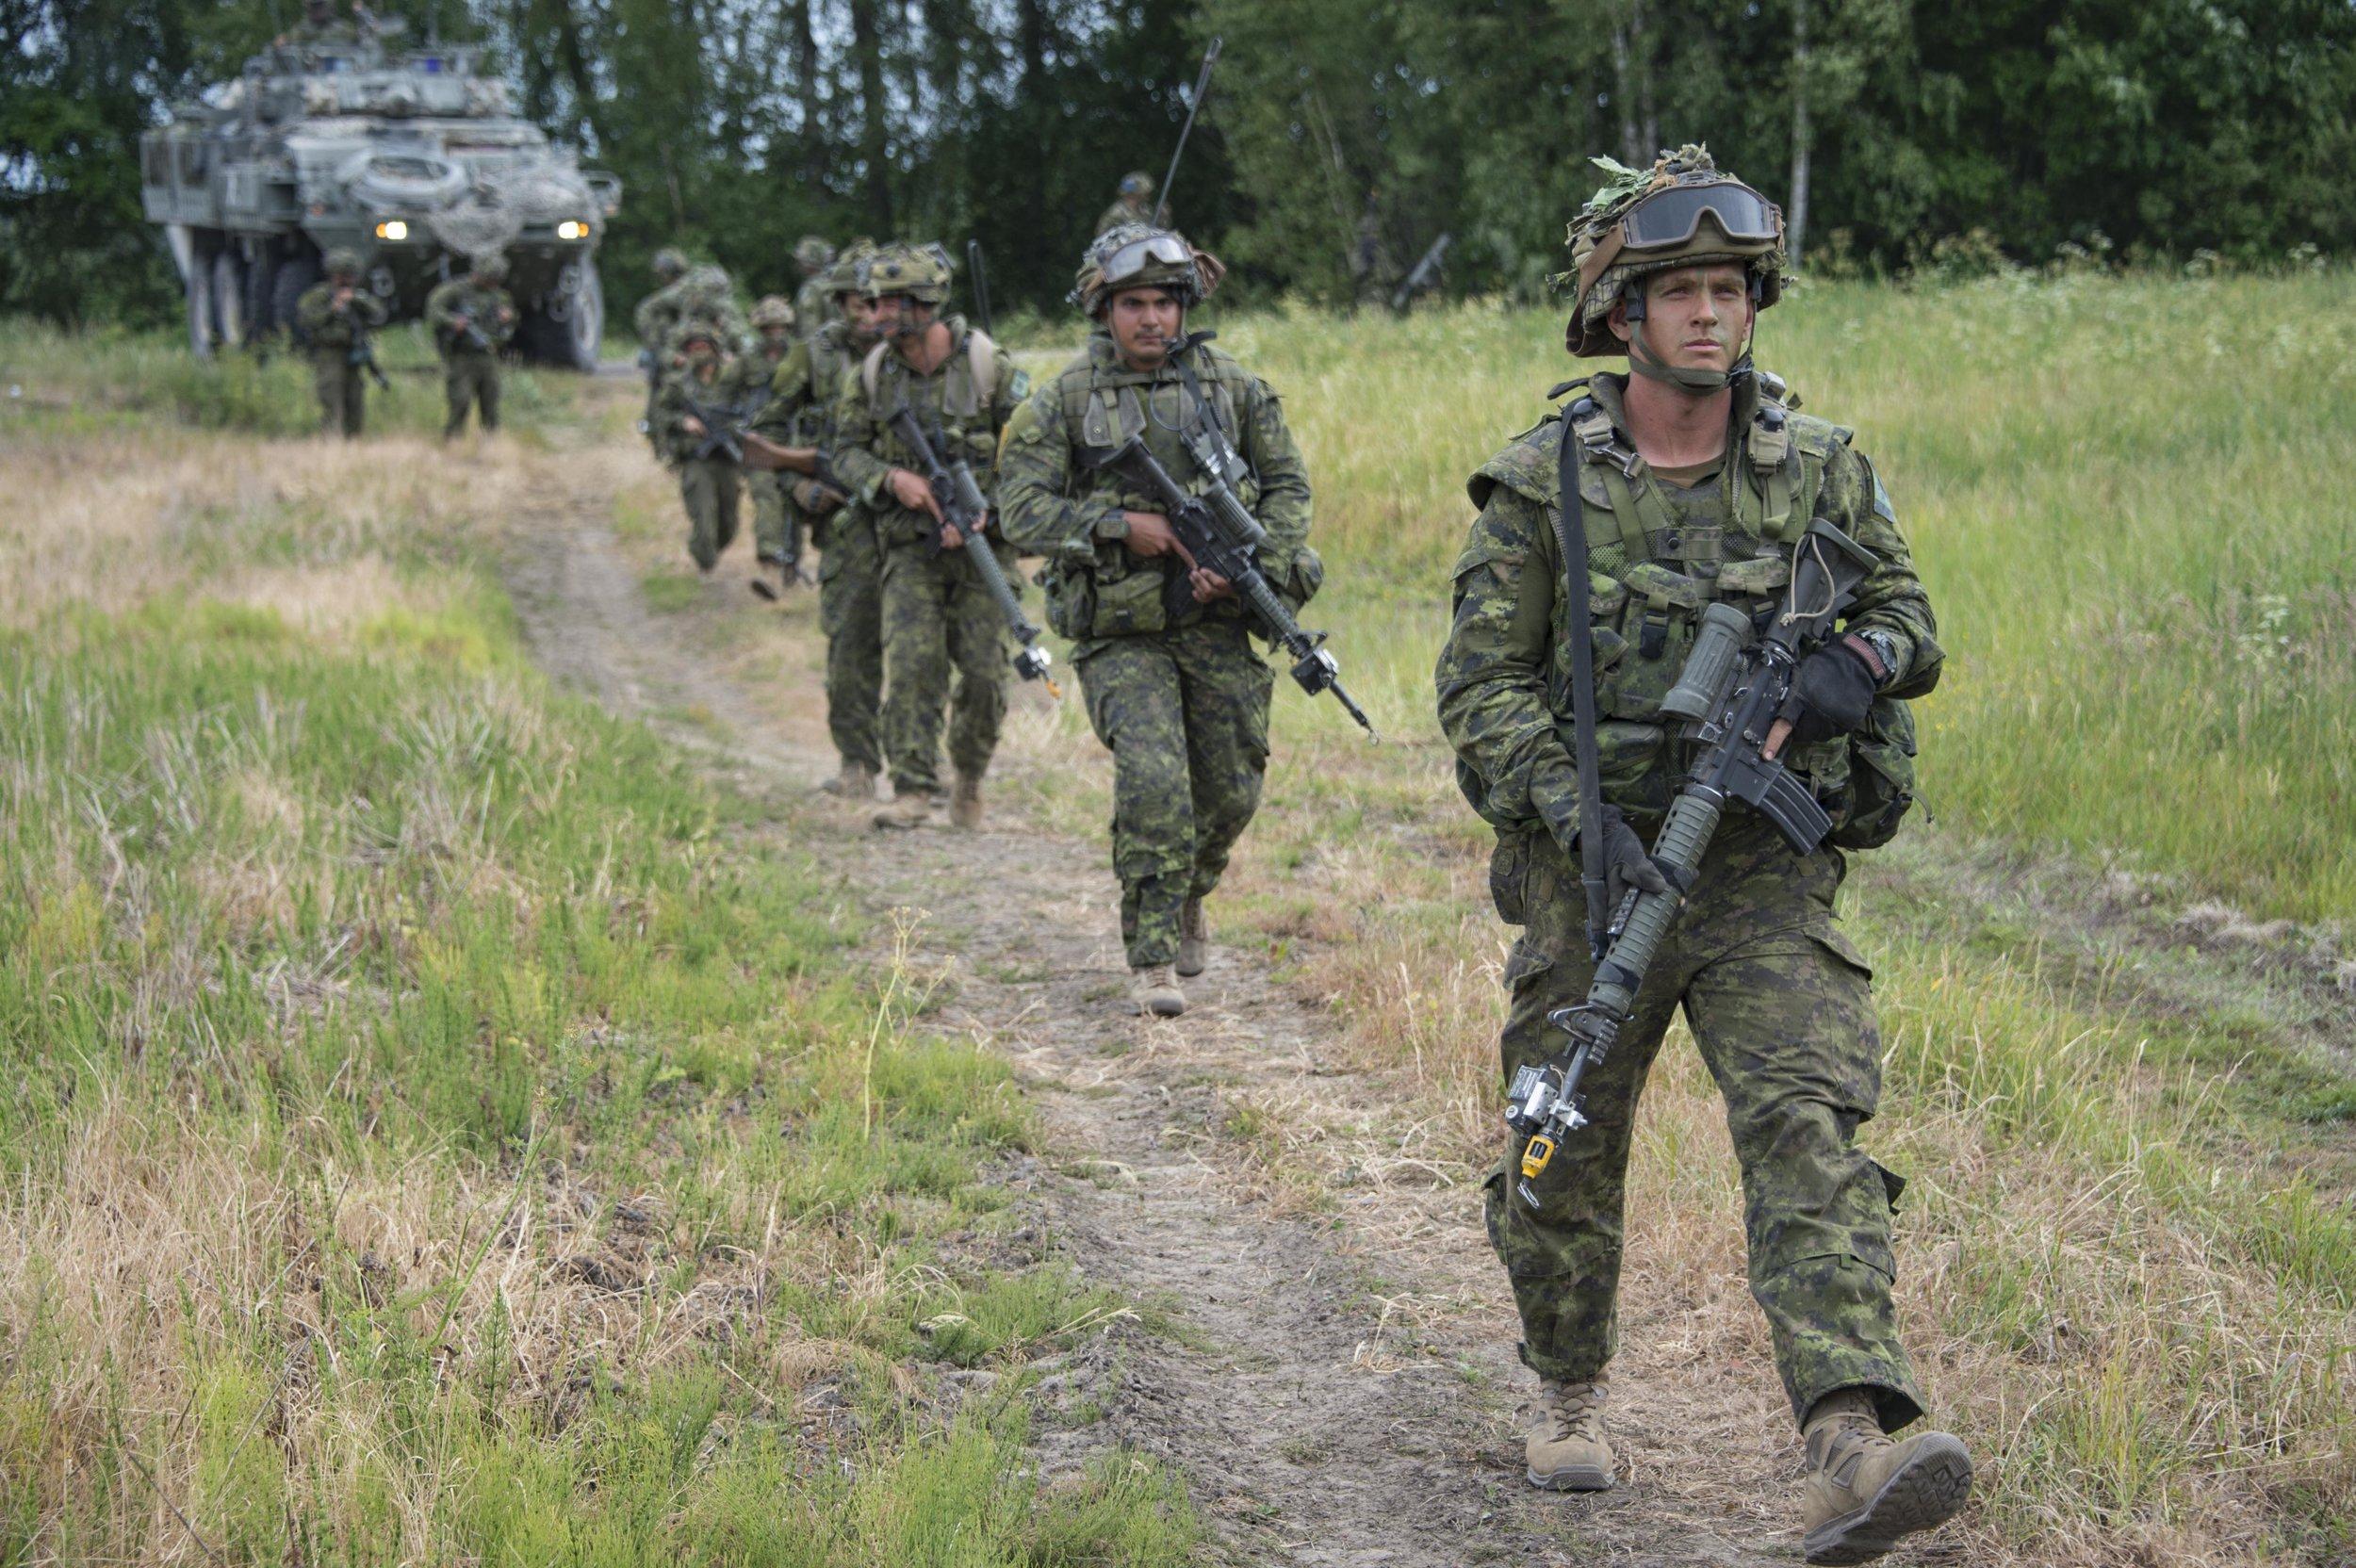 Canadian soldiers from India Company, enhanced Forward Presence Battle Group Latvia, move toward the woods during Exercise SABER STRIKE 2018, near Skrunda, Latvia on June 11, 2018. Photo: Cpl Jean-Roch Chabot, eFP BG LATVIA Public Affairs RP15-2018-0140-059